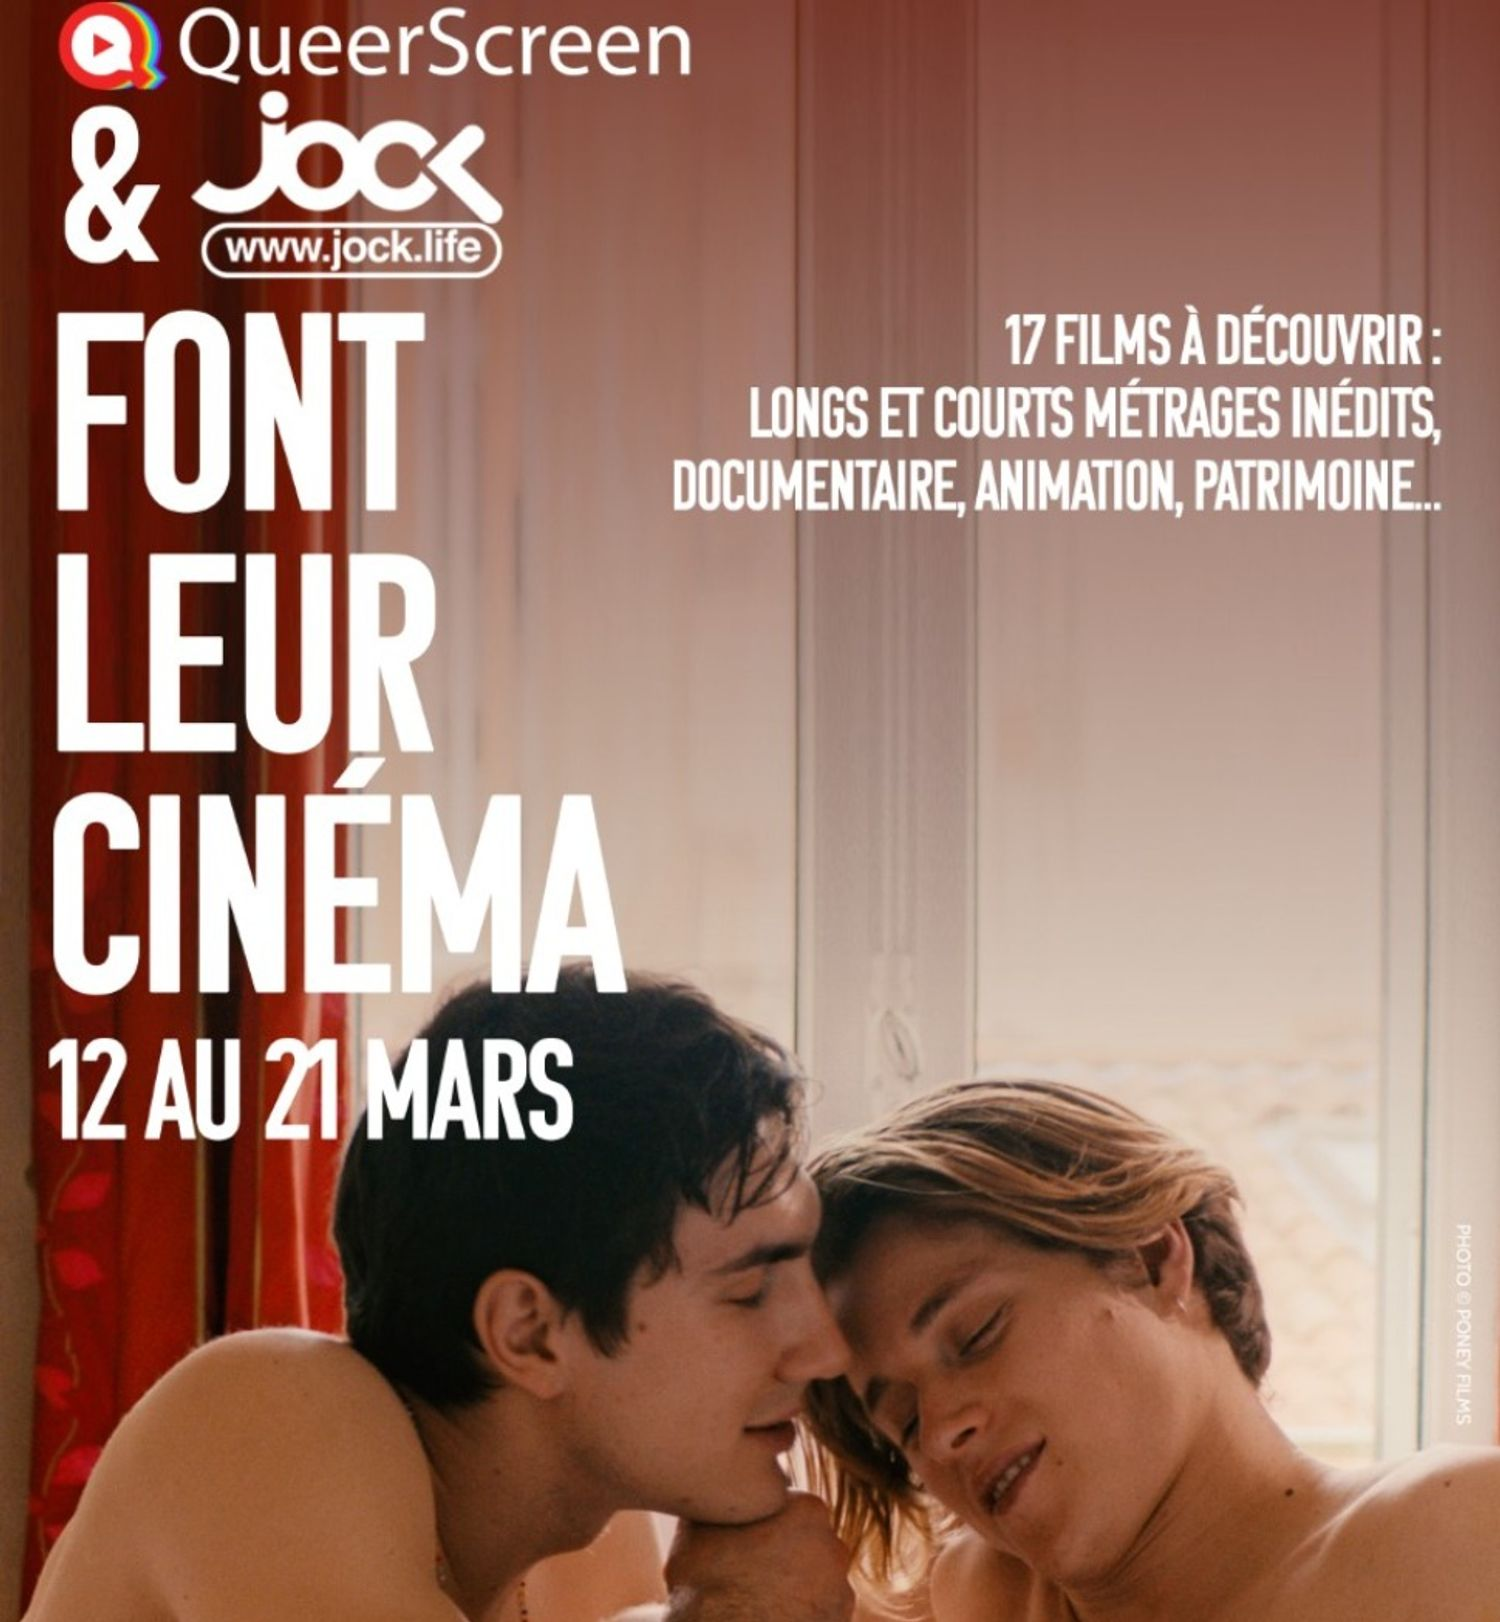 Queerscreen et jock.life organisent un festival de film LGBT+